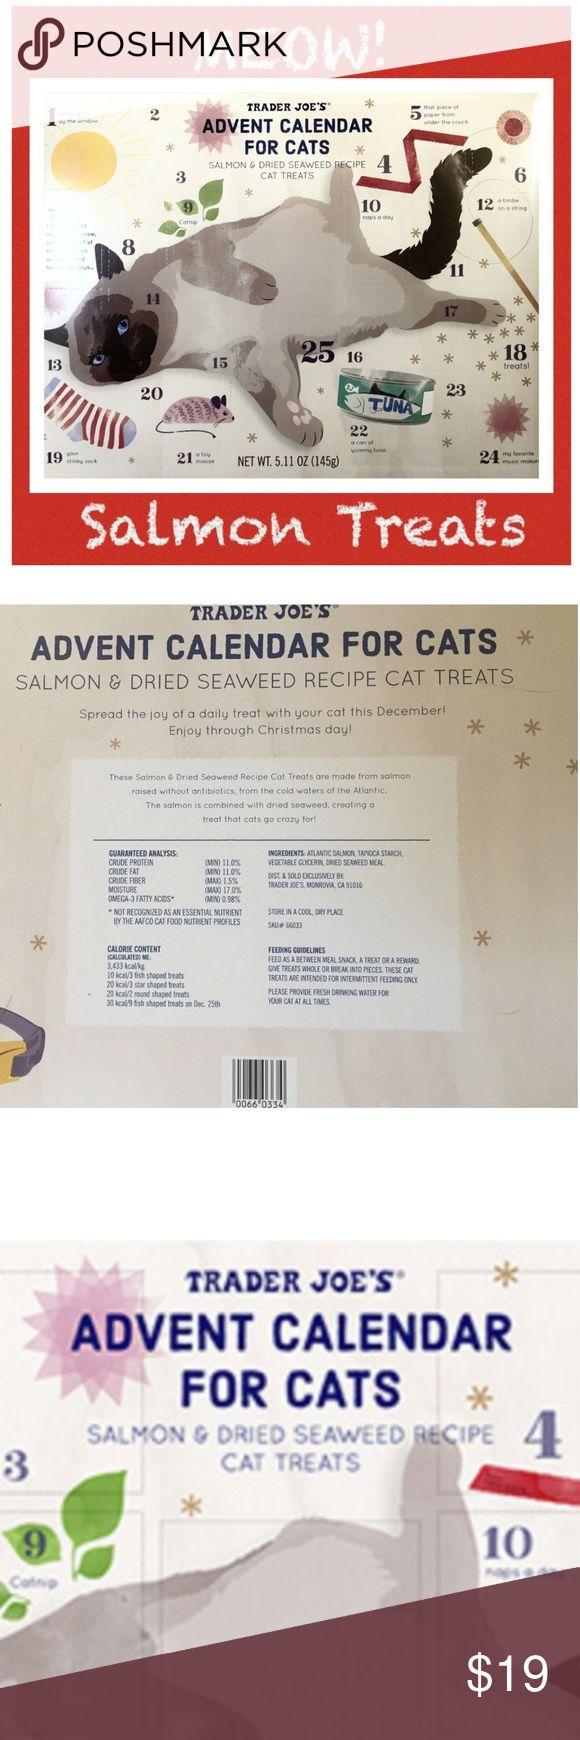 Cat Holiday Advent Calendar Cat Treats Christmas TRADER